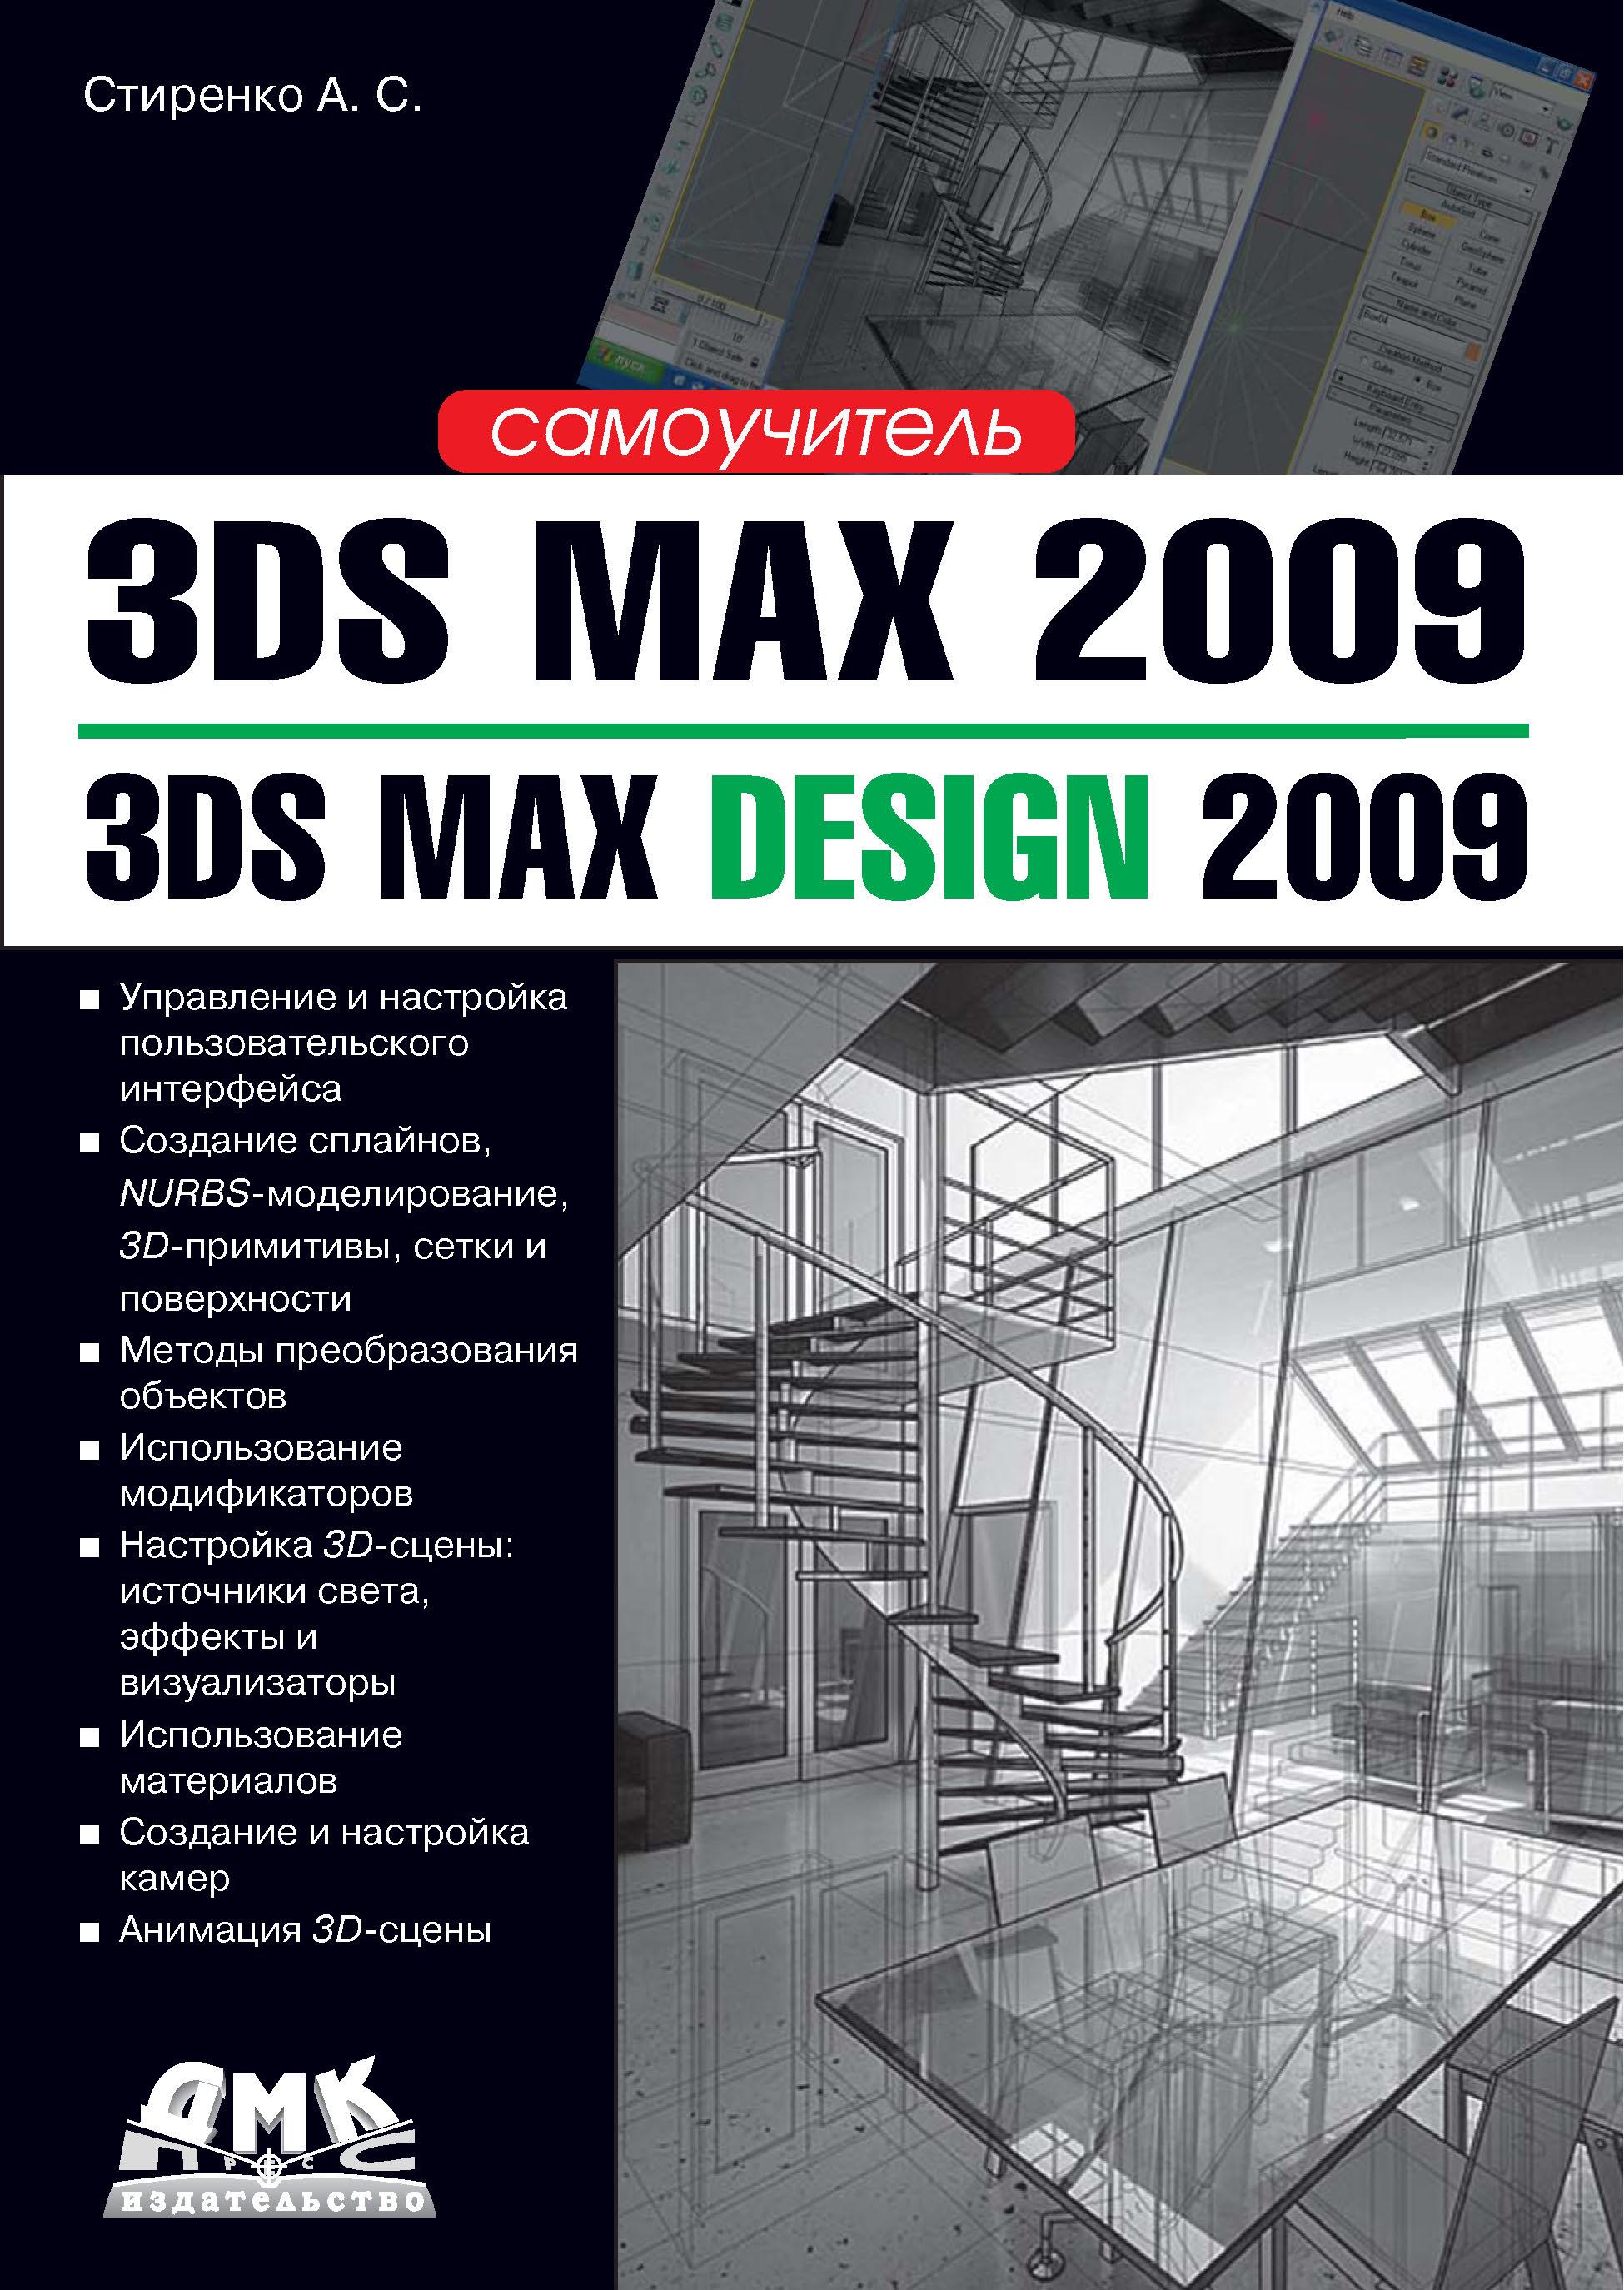 А. С. Стиренко 3ds Max 2009 / 3ds Max Design 2009. Самоучитель teachpro 3ds max 6